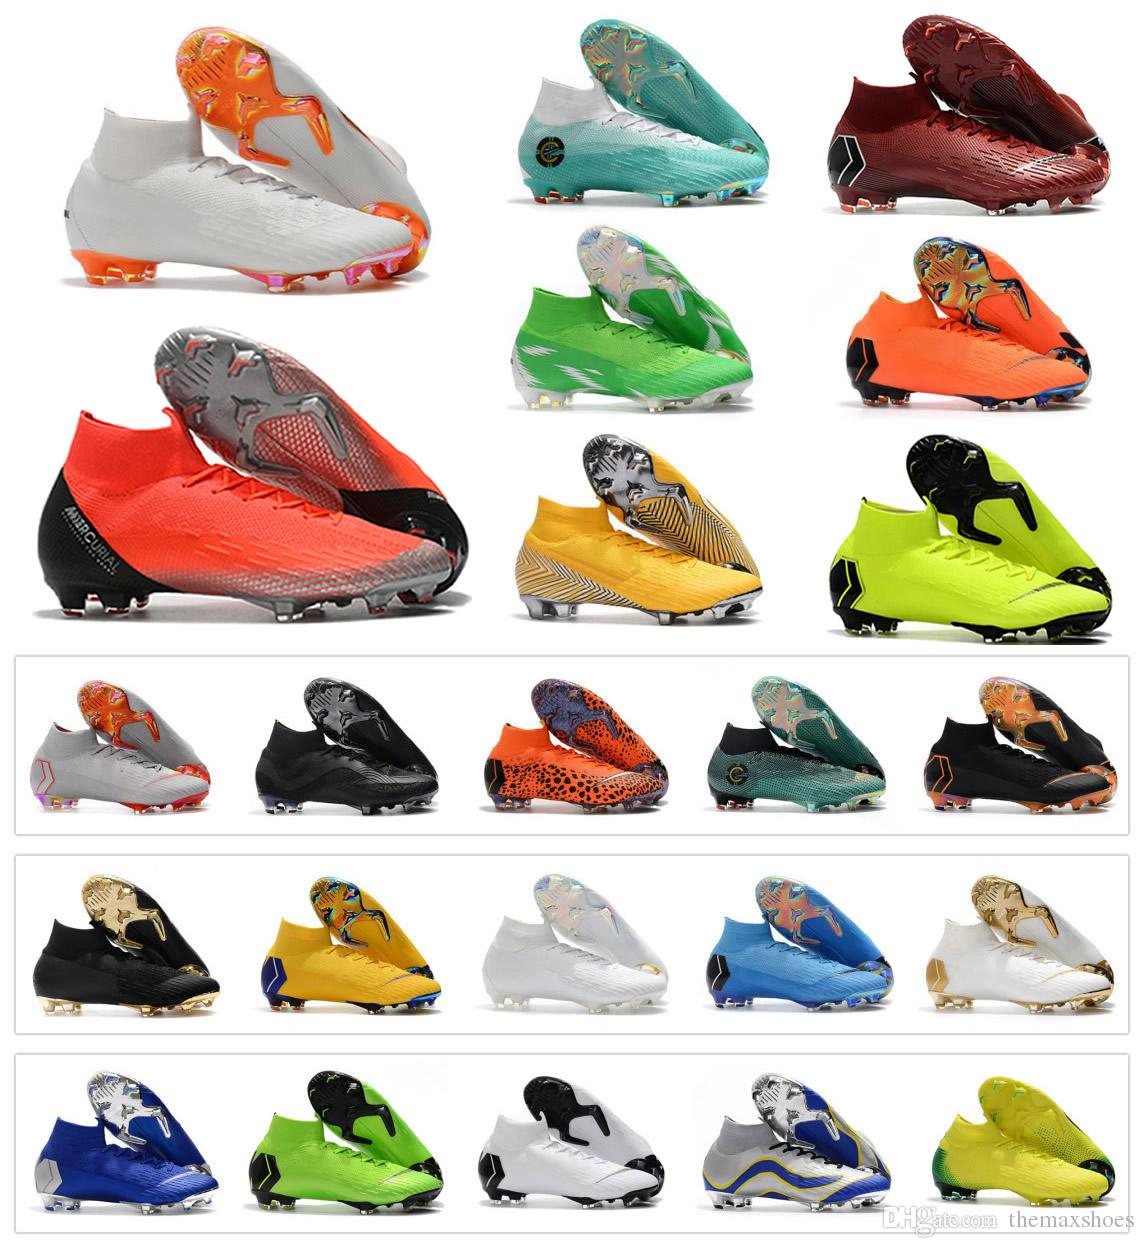 new product 04341 c8536 Acheter Mercurial Superfly VI 360 Elite FG KJ 6 XII 12 CR7 Ronaldo Neymar Hommes  Femmes Garçons Chaussures De Soccer Haut Football Bottes Crampons Taille 35  ...